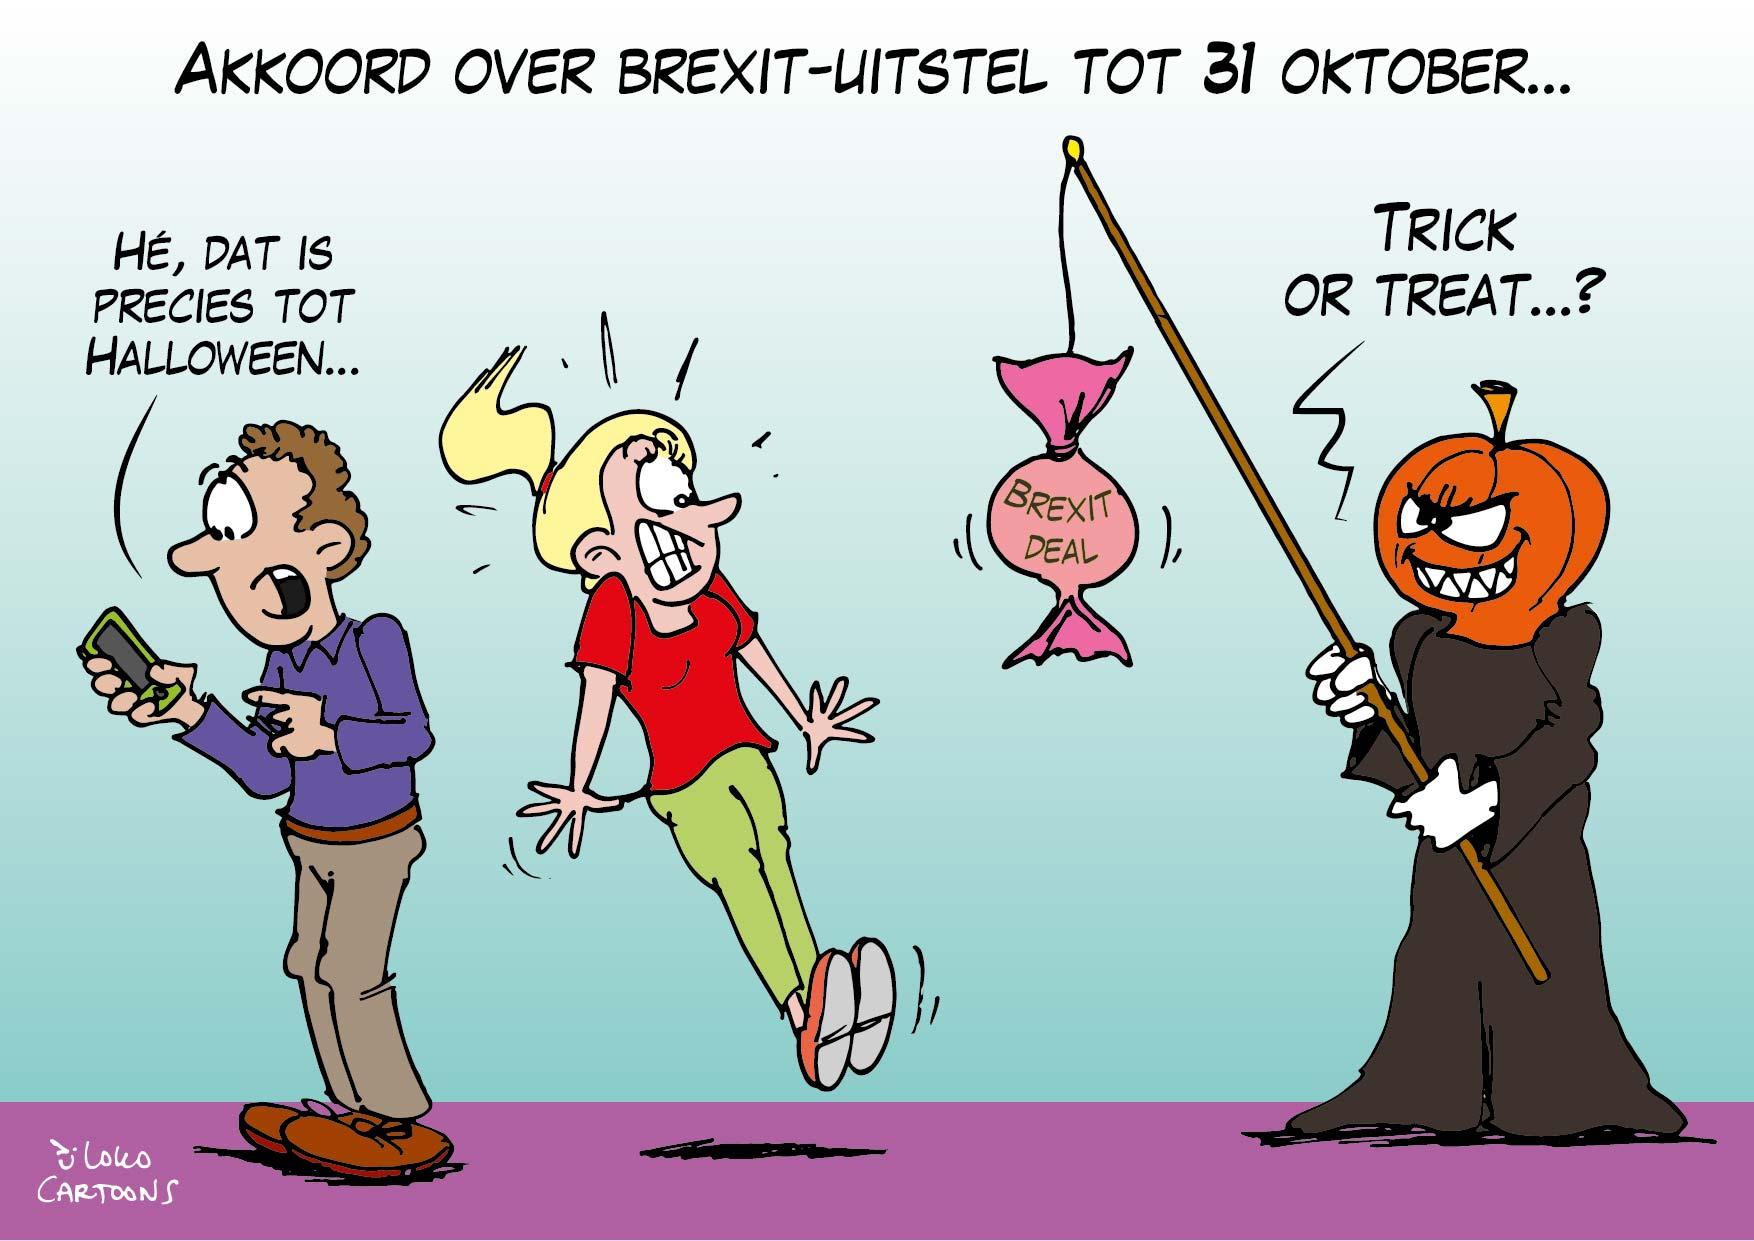 Akkoord over Brexit-uitstel tot 31 oktober…